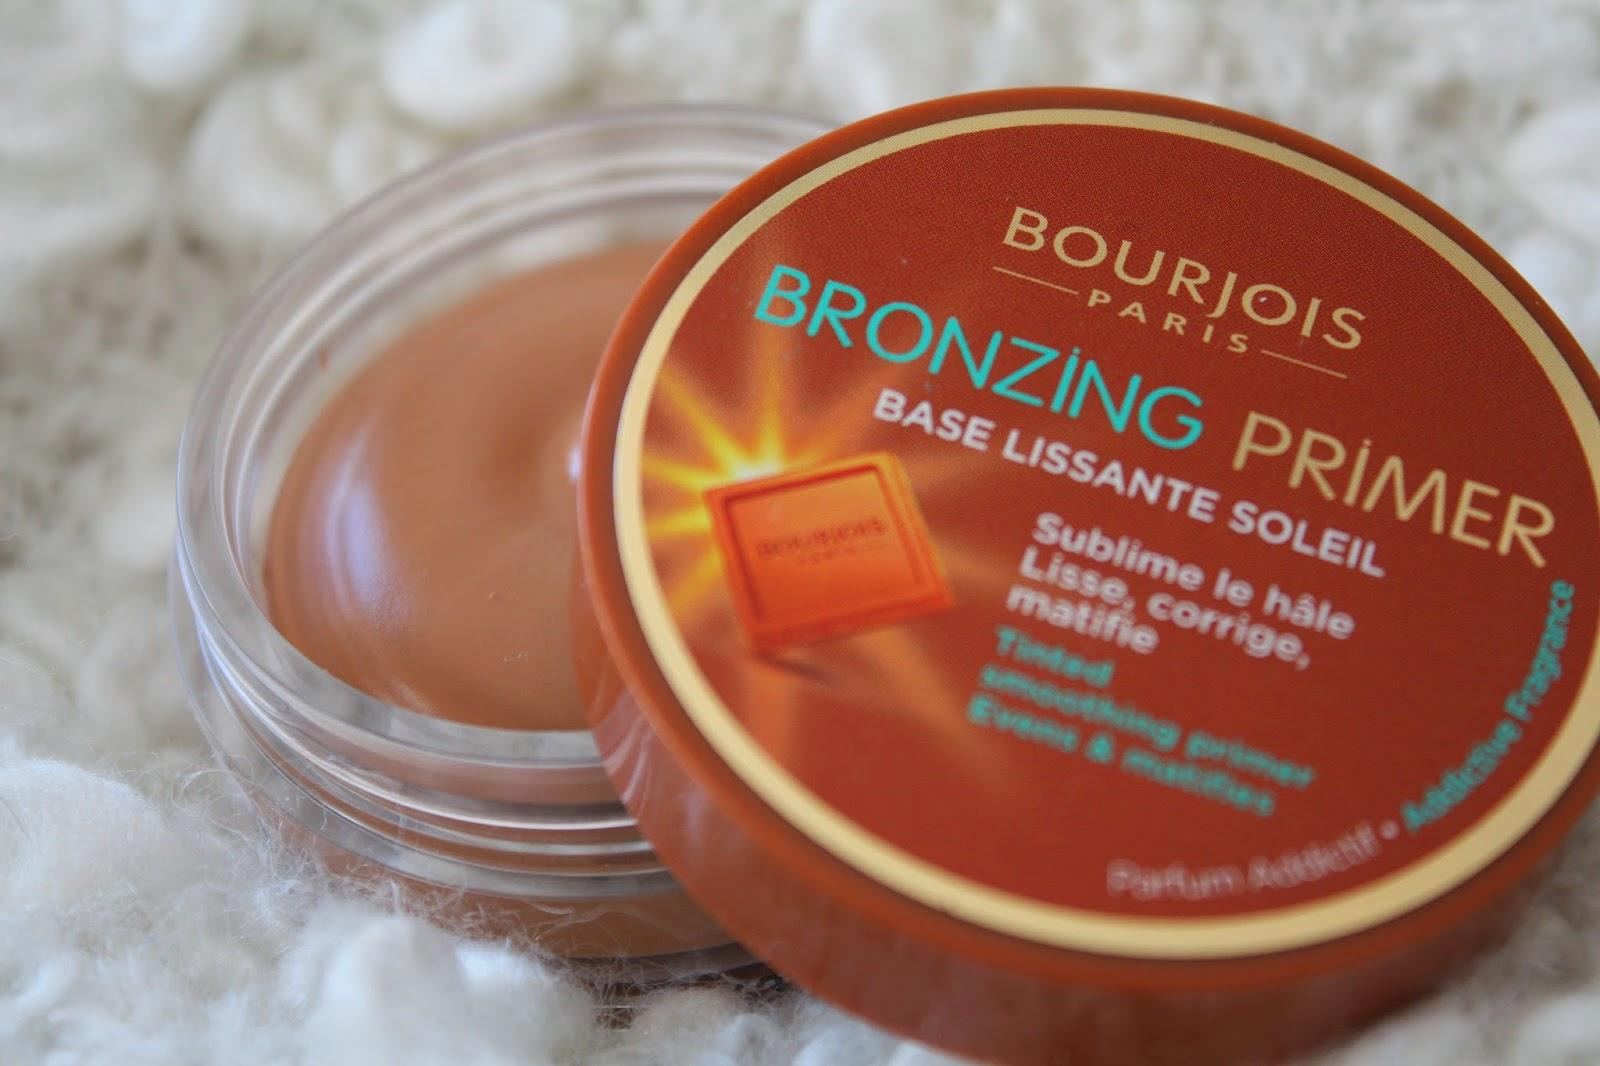 bourjois bronzing primer packaging